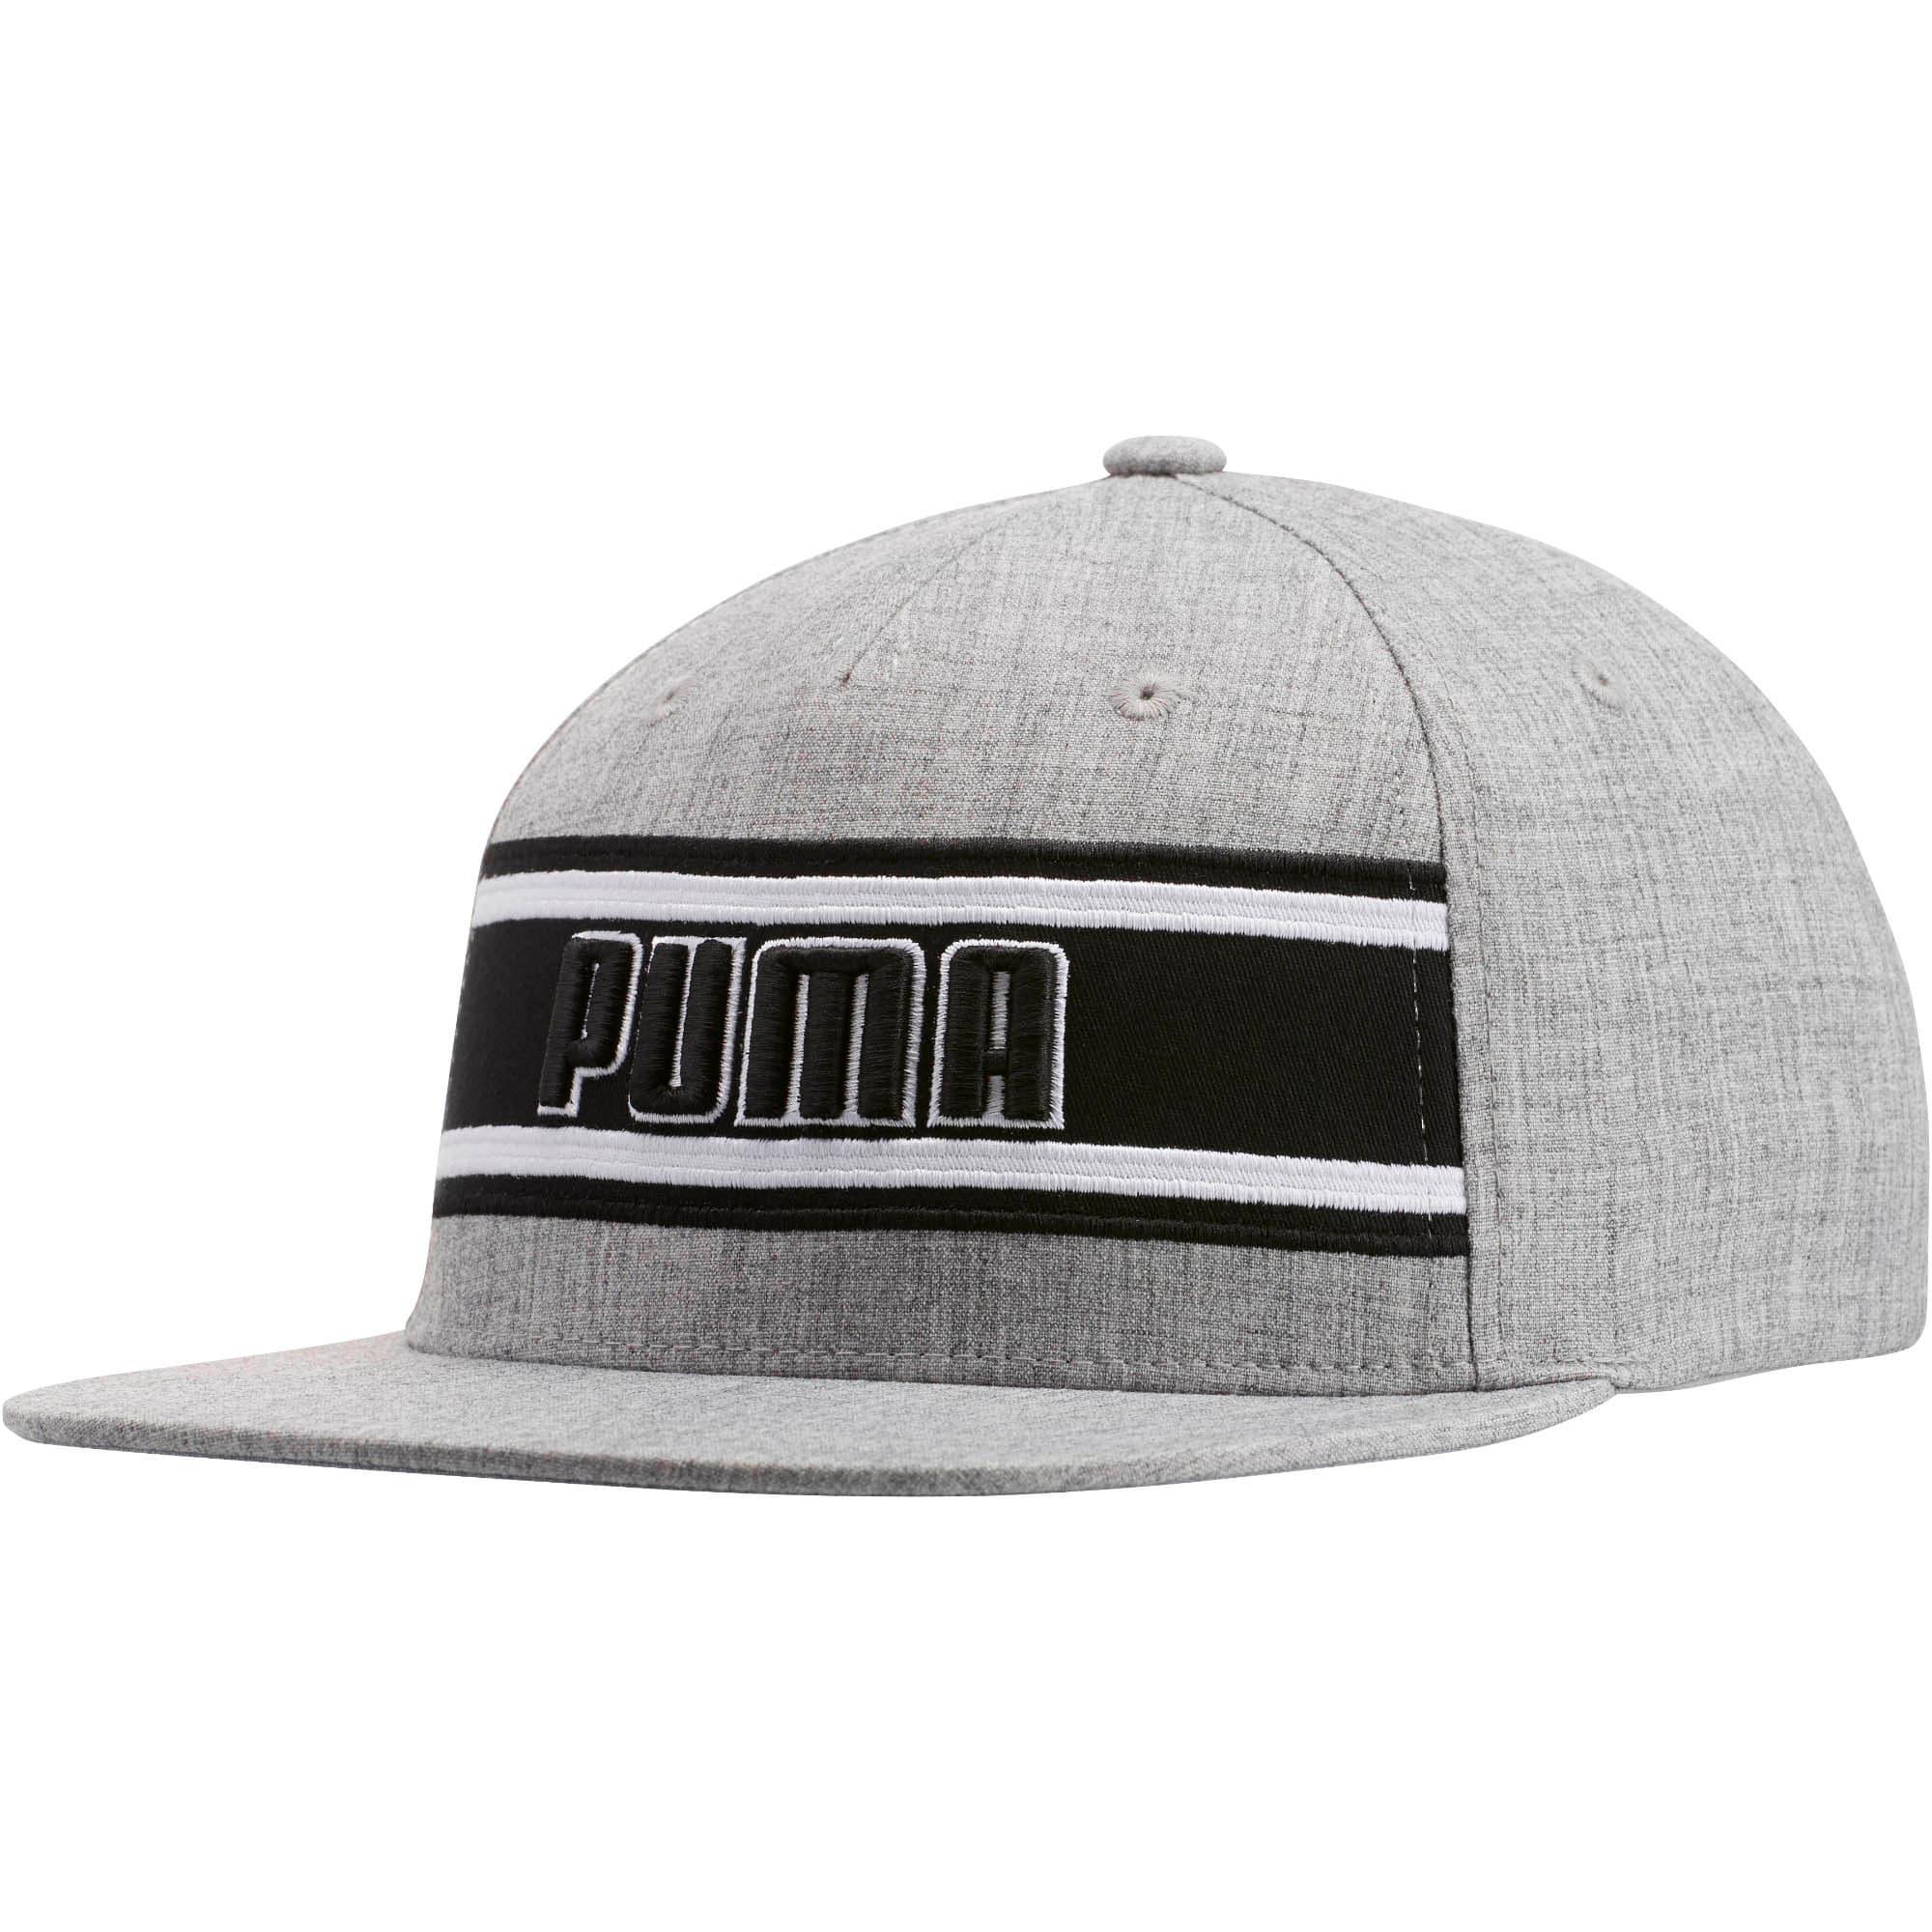 Thumbnail 1 of STAGE DIVE FLATBILL FLEXFIT Hat, GREY/BLACK, medium